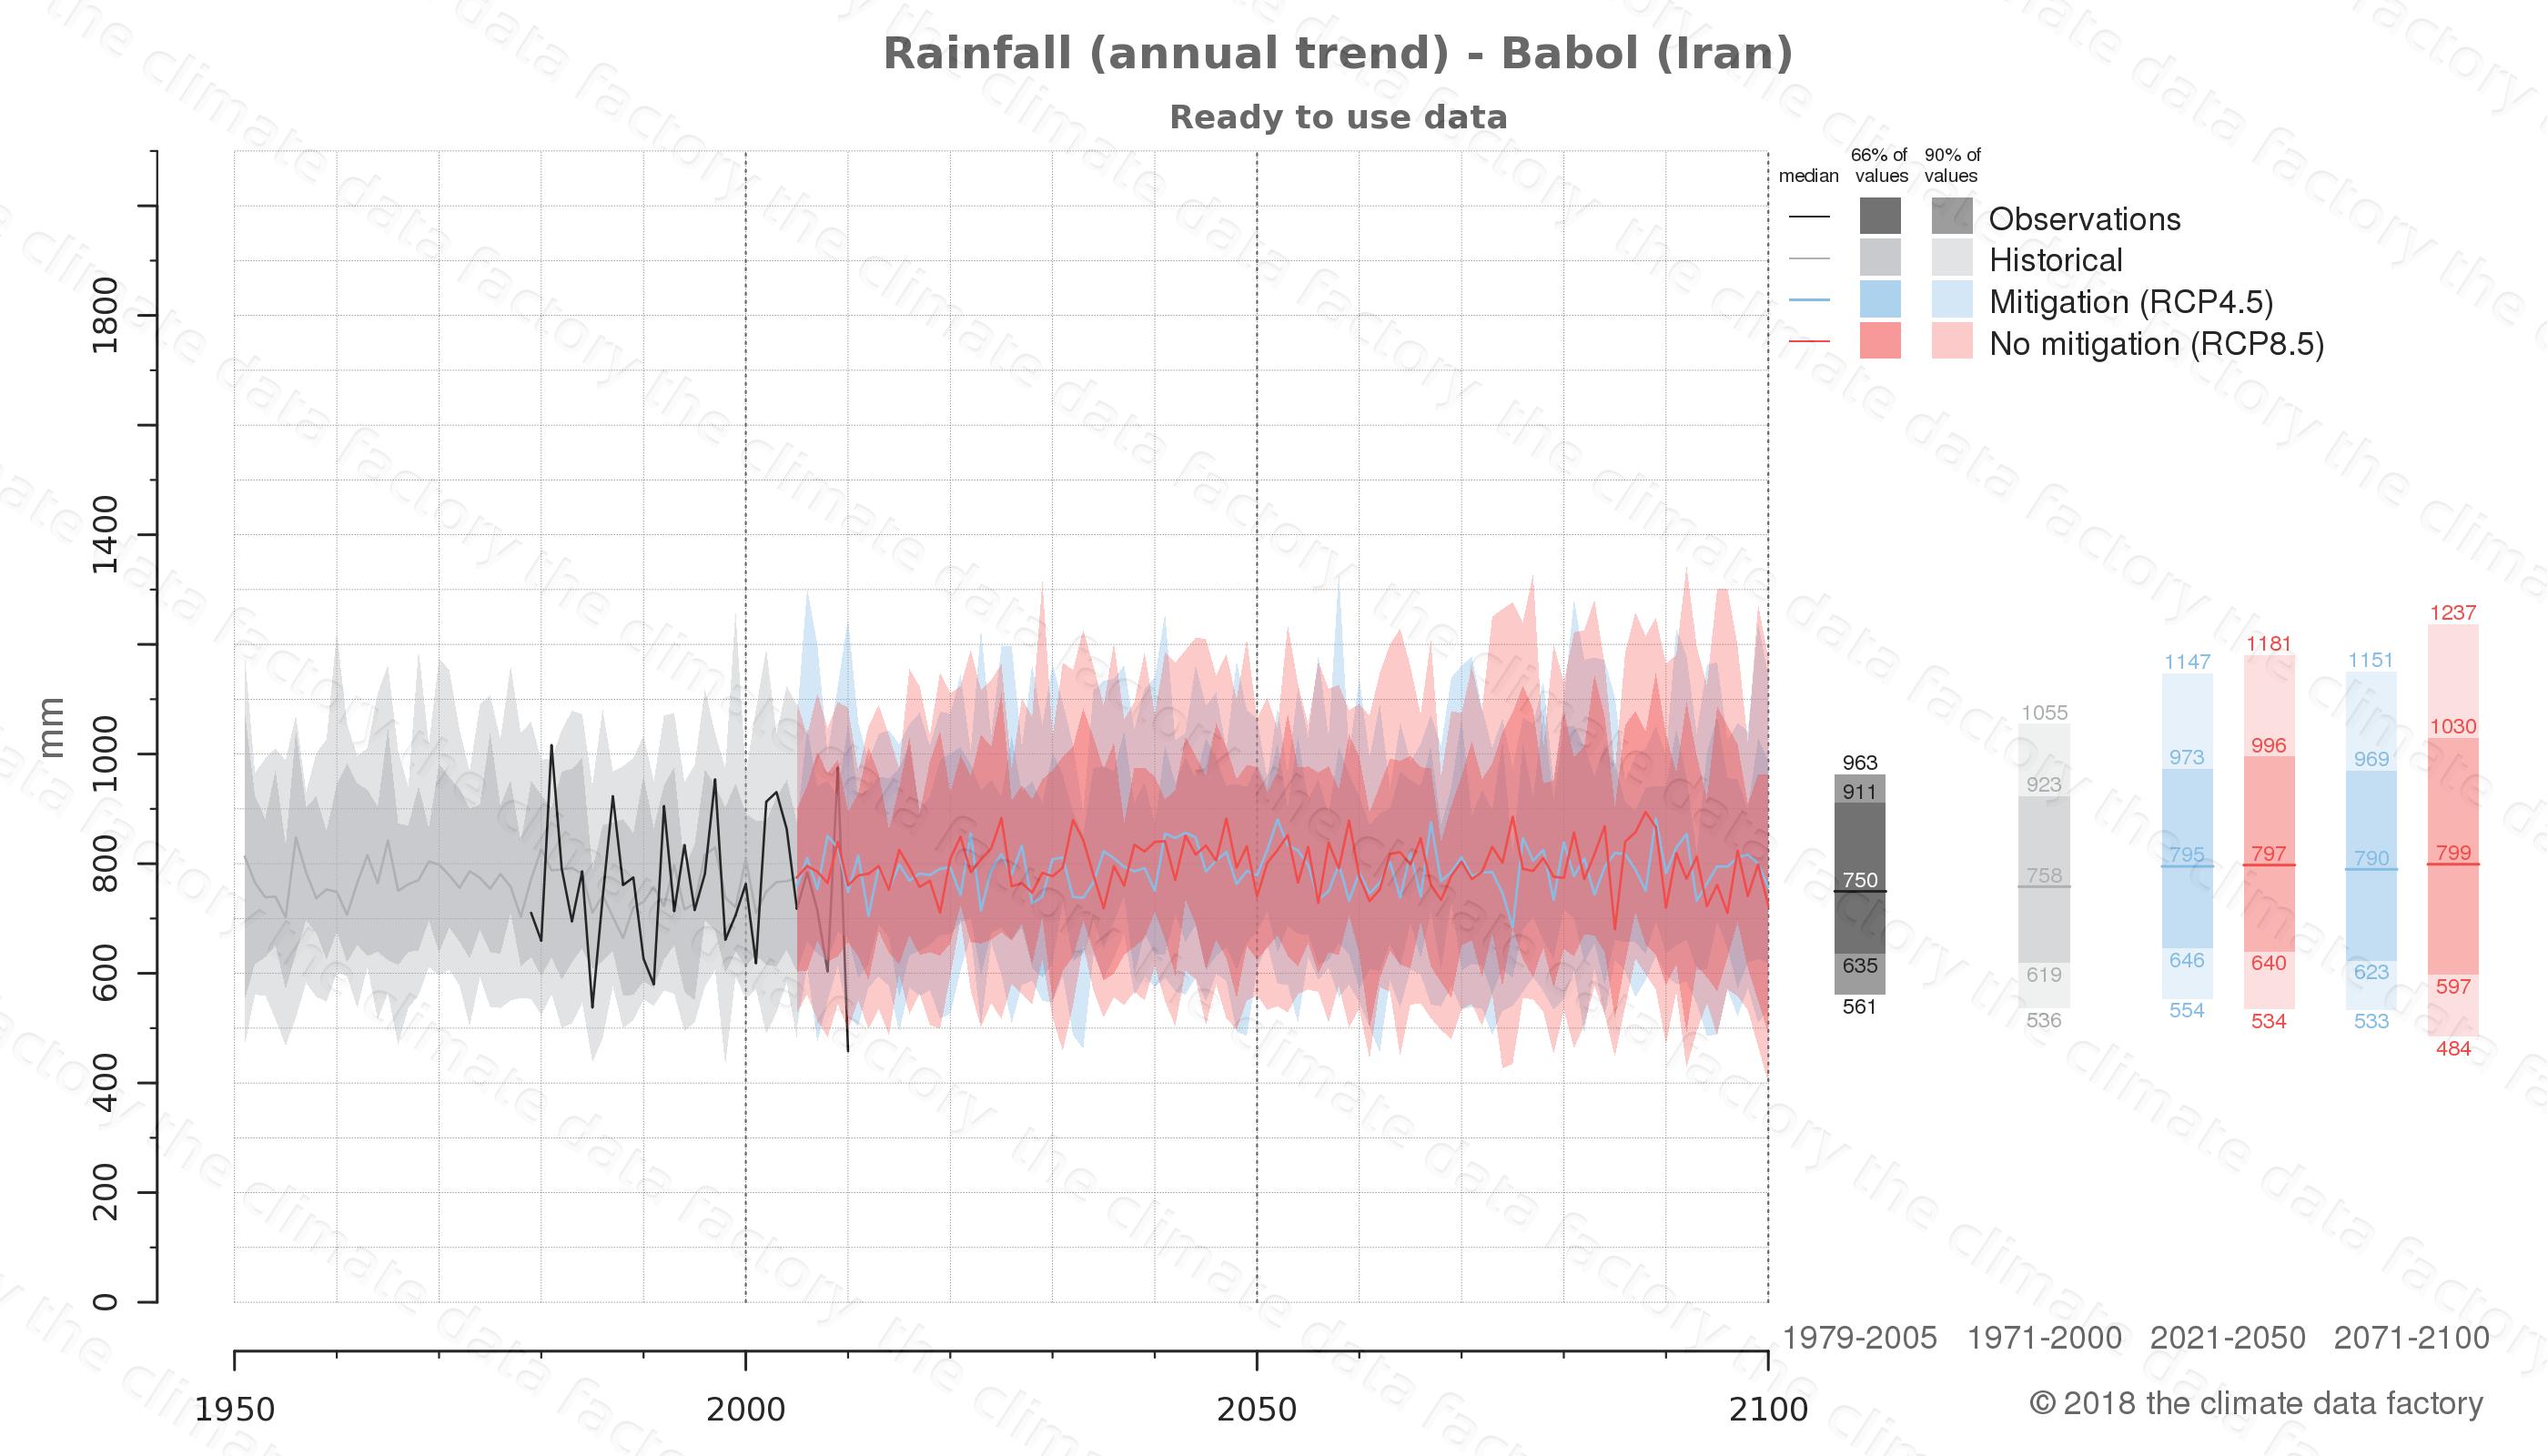 climate change data policy adaptation climate graph city data rainfall babol iran